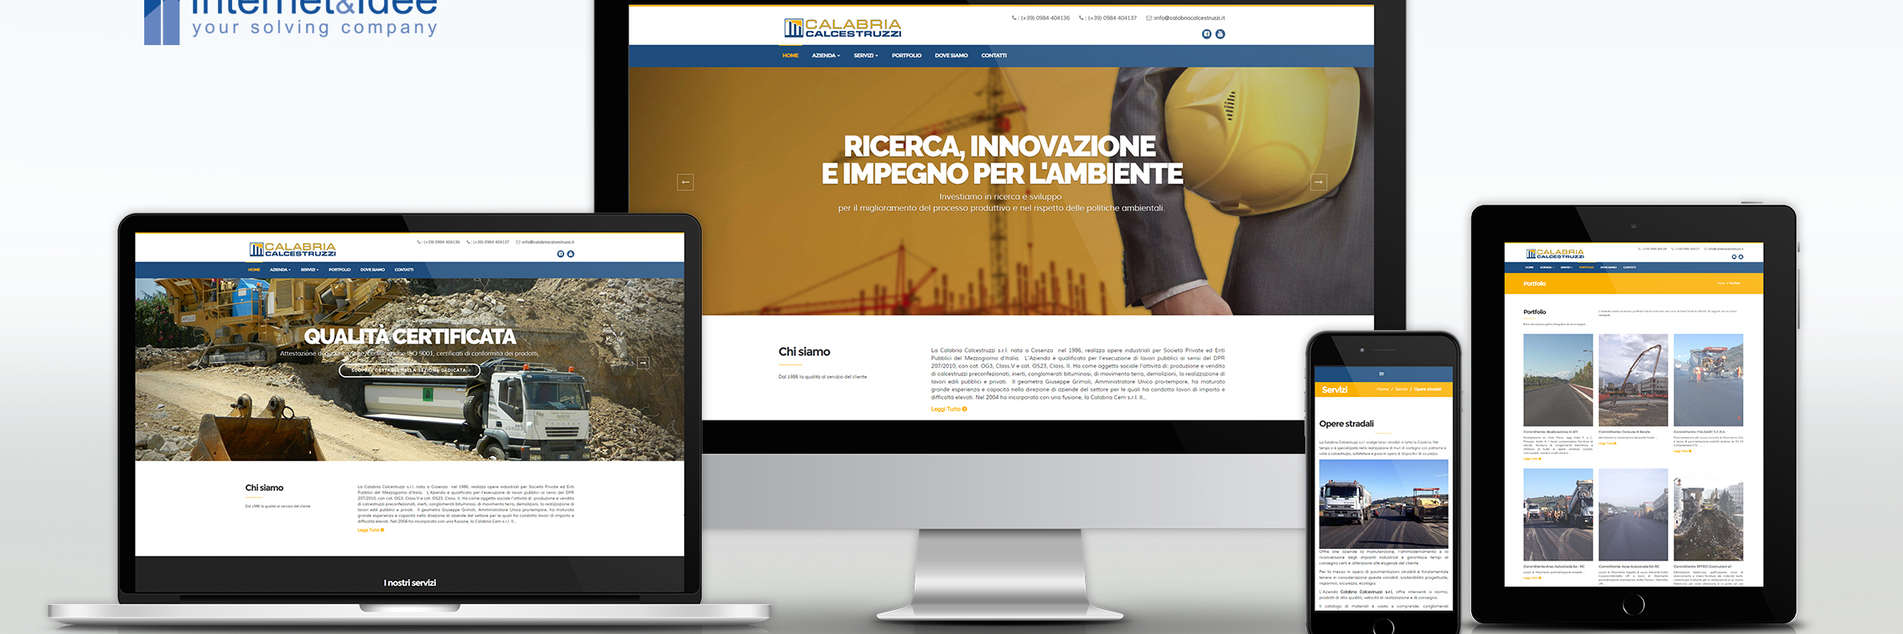 Online the Calabria Calcestruzzi site